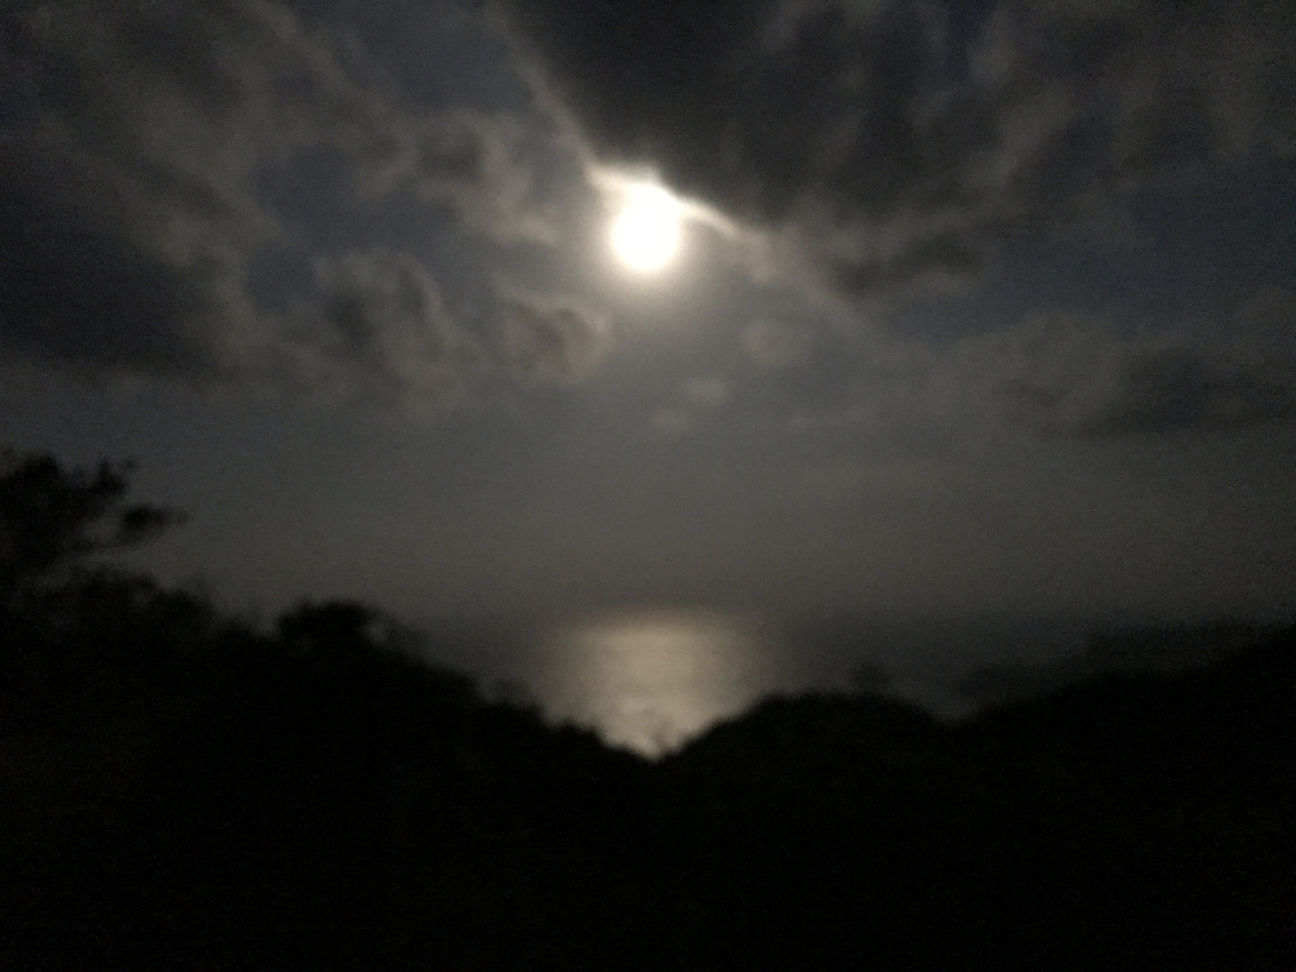 撮影:淺井聖 iPhone 7(f1.8, 1/4)